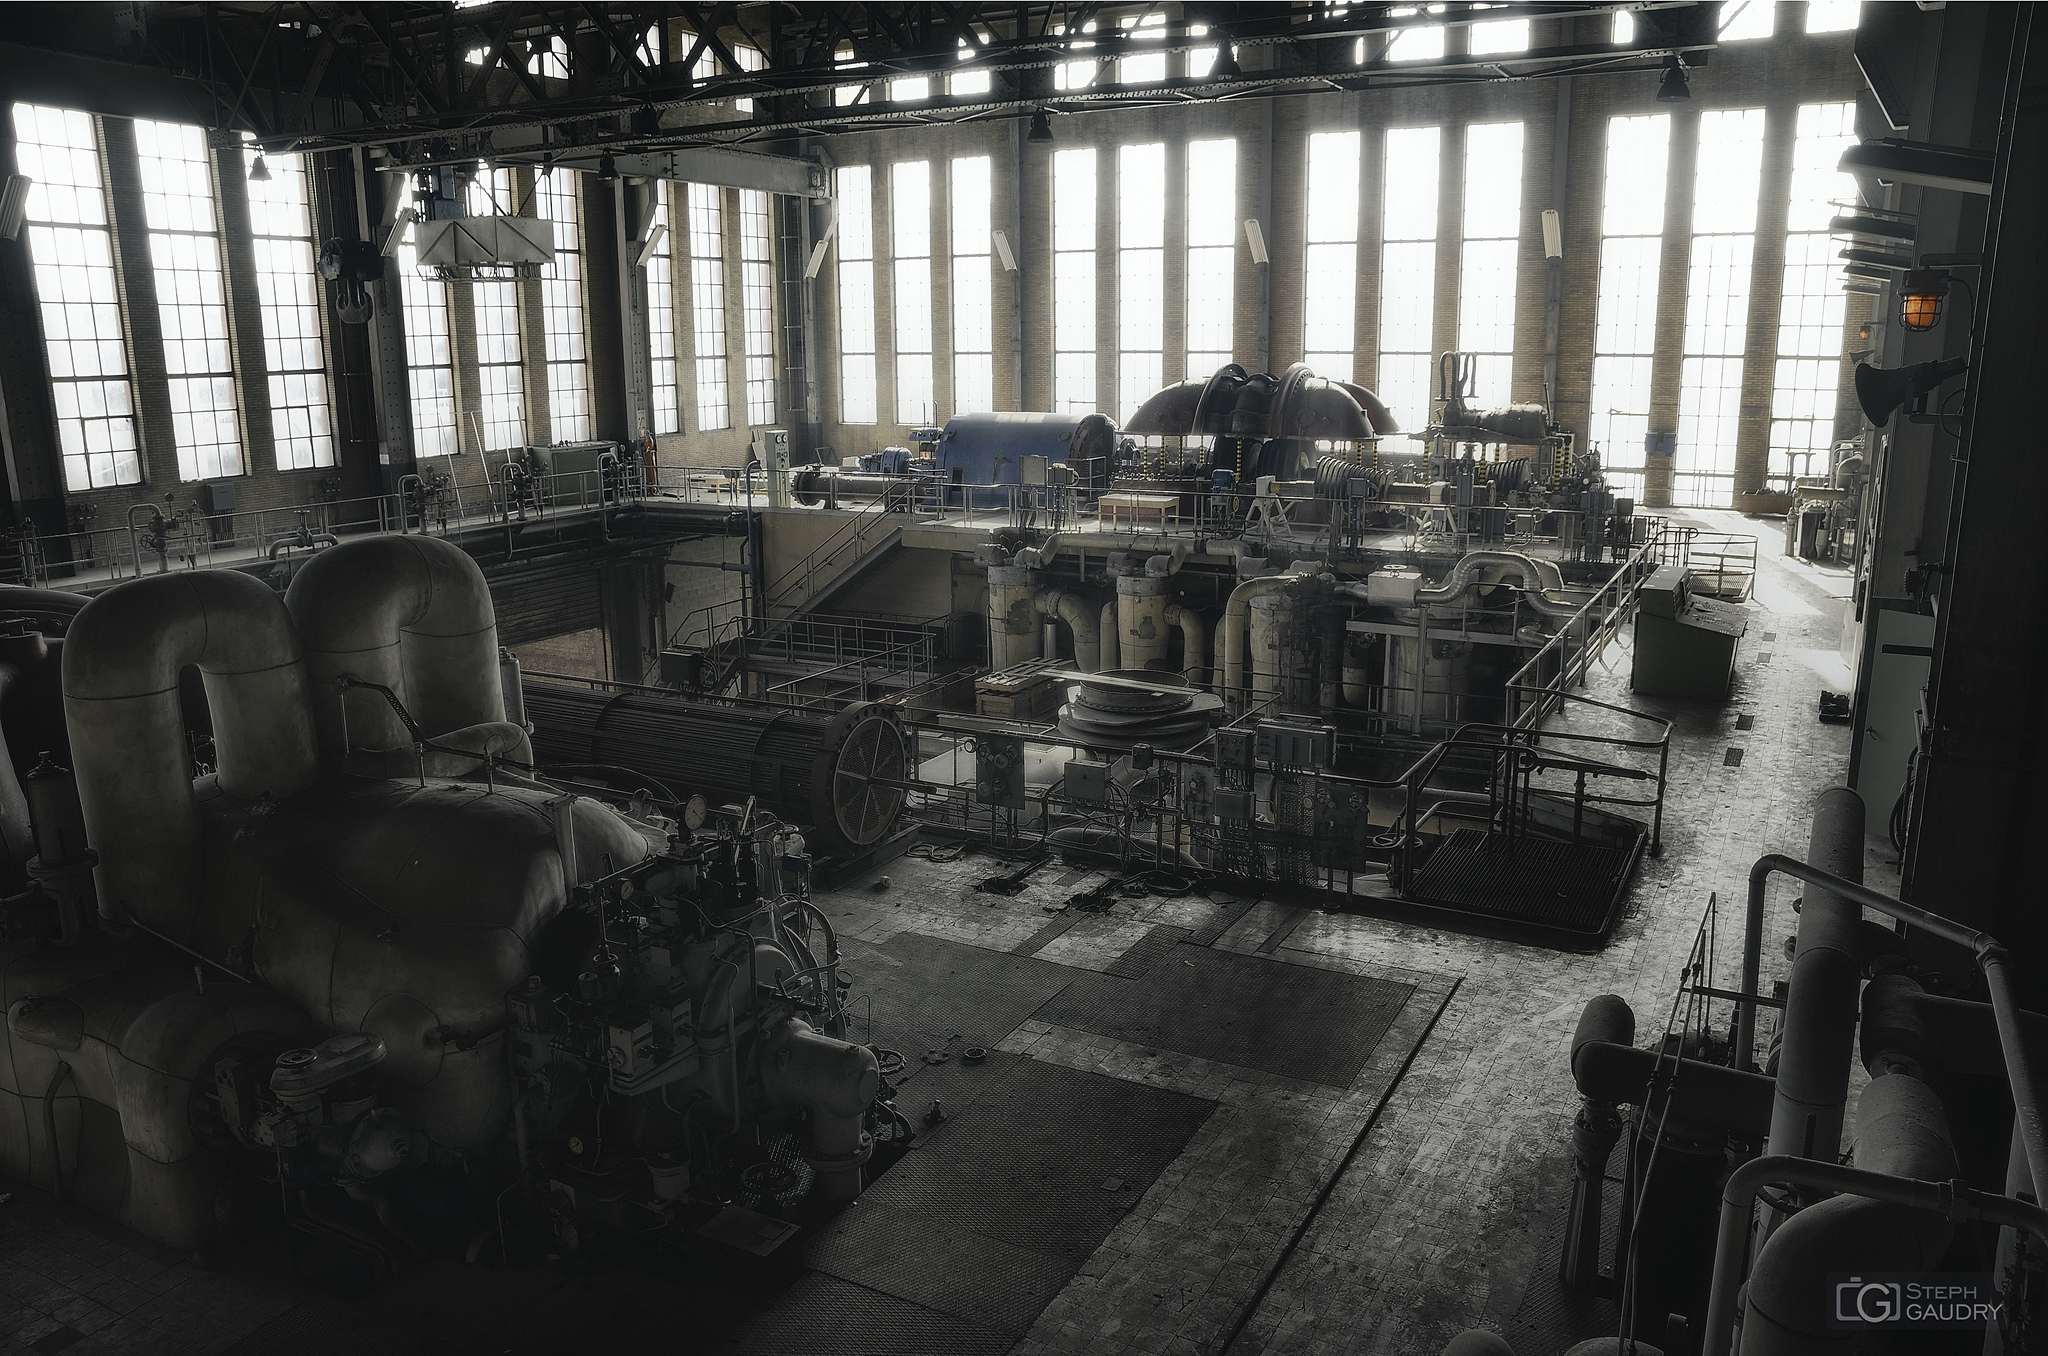 Turbine and generator rotor [Cliquez pour lancer le diaporama]